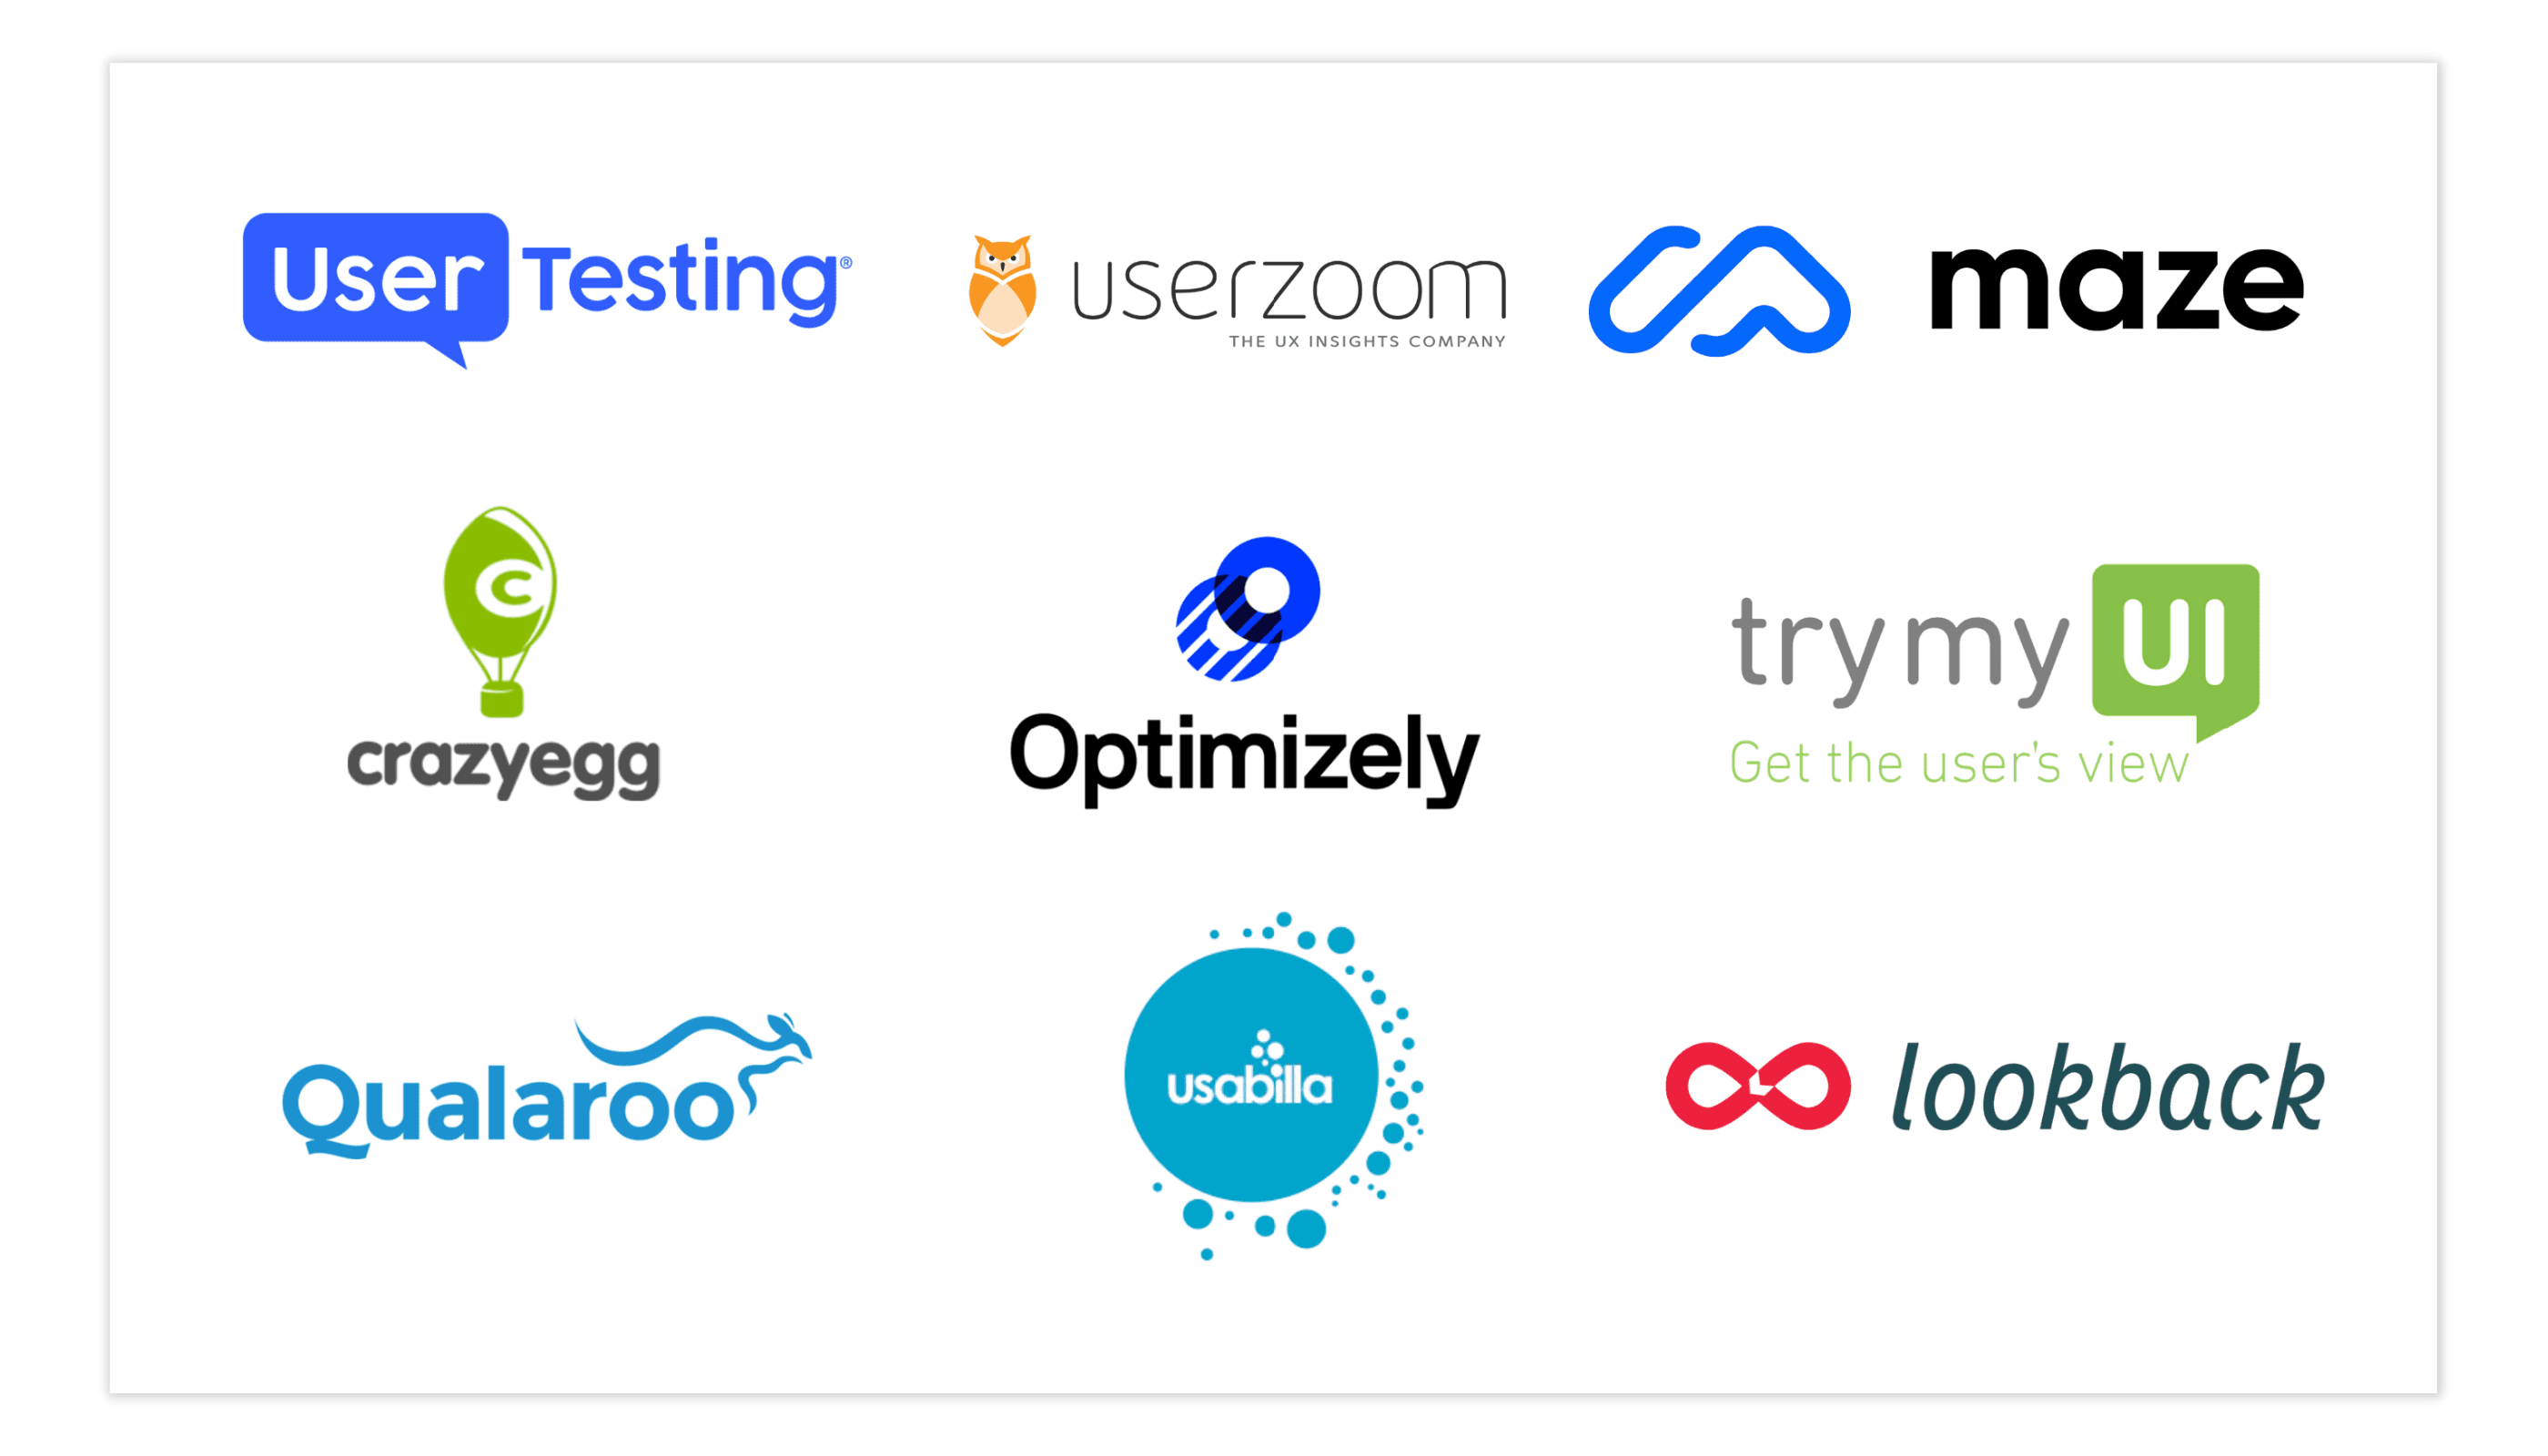 Usability Testing Tools Logos